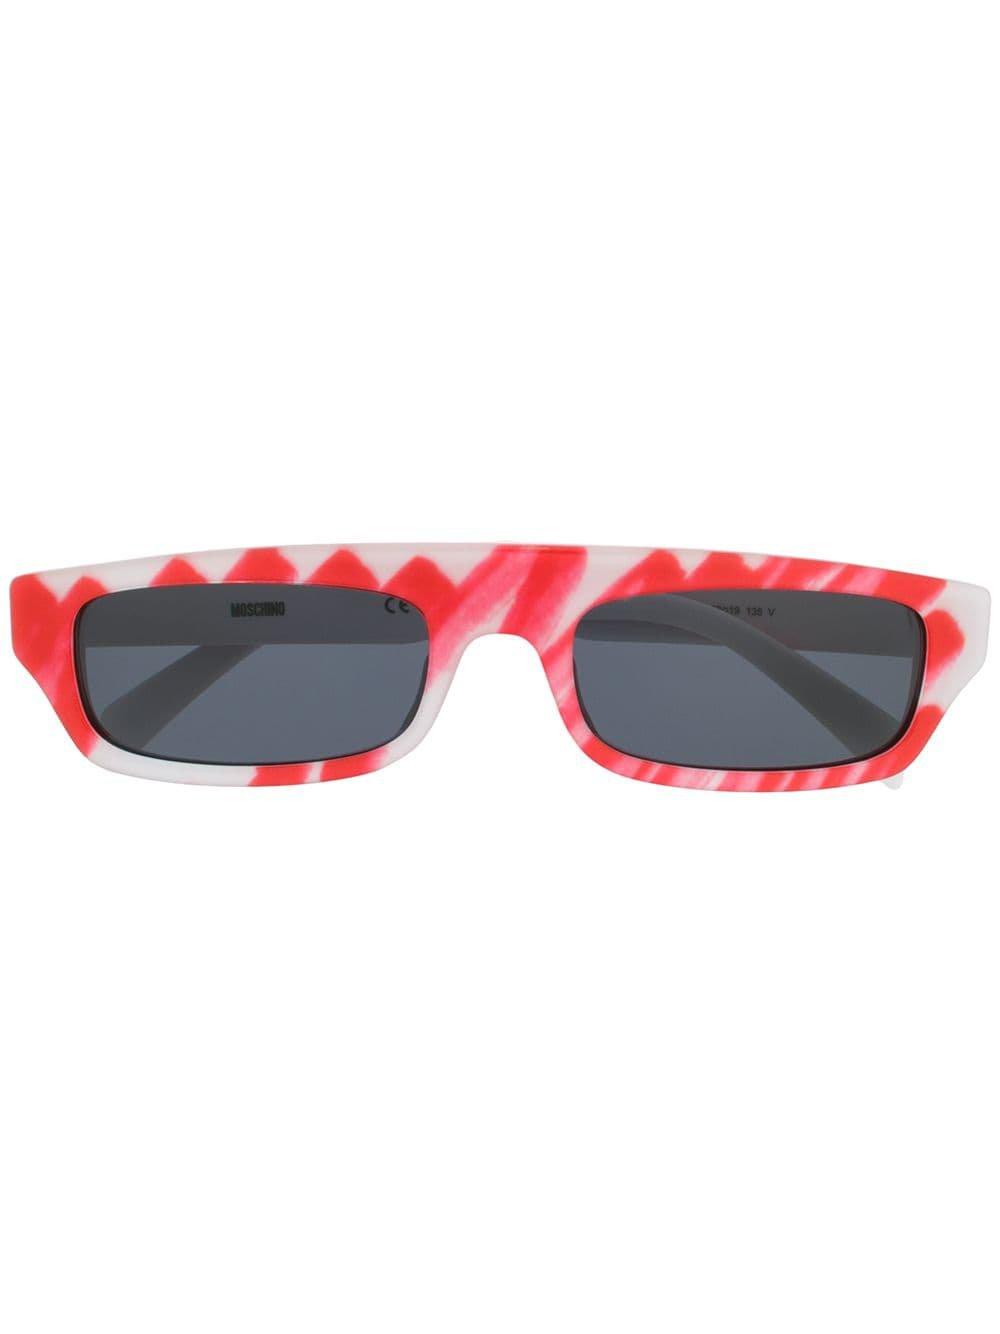 Moschino Eyewear Brushstroke Sunglasses - Farfetch